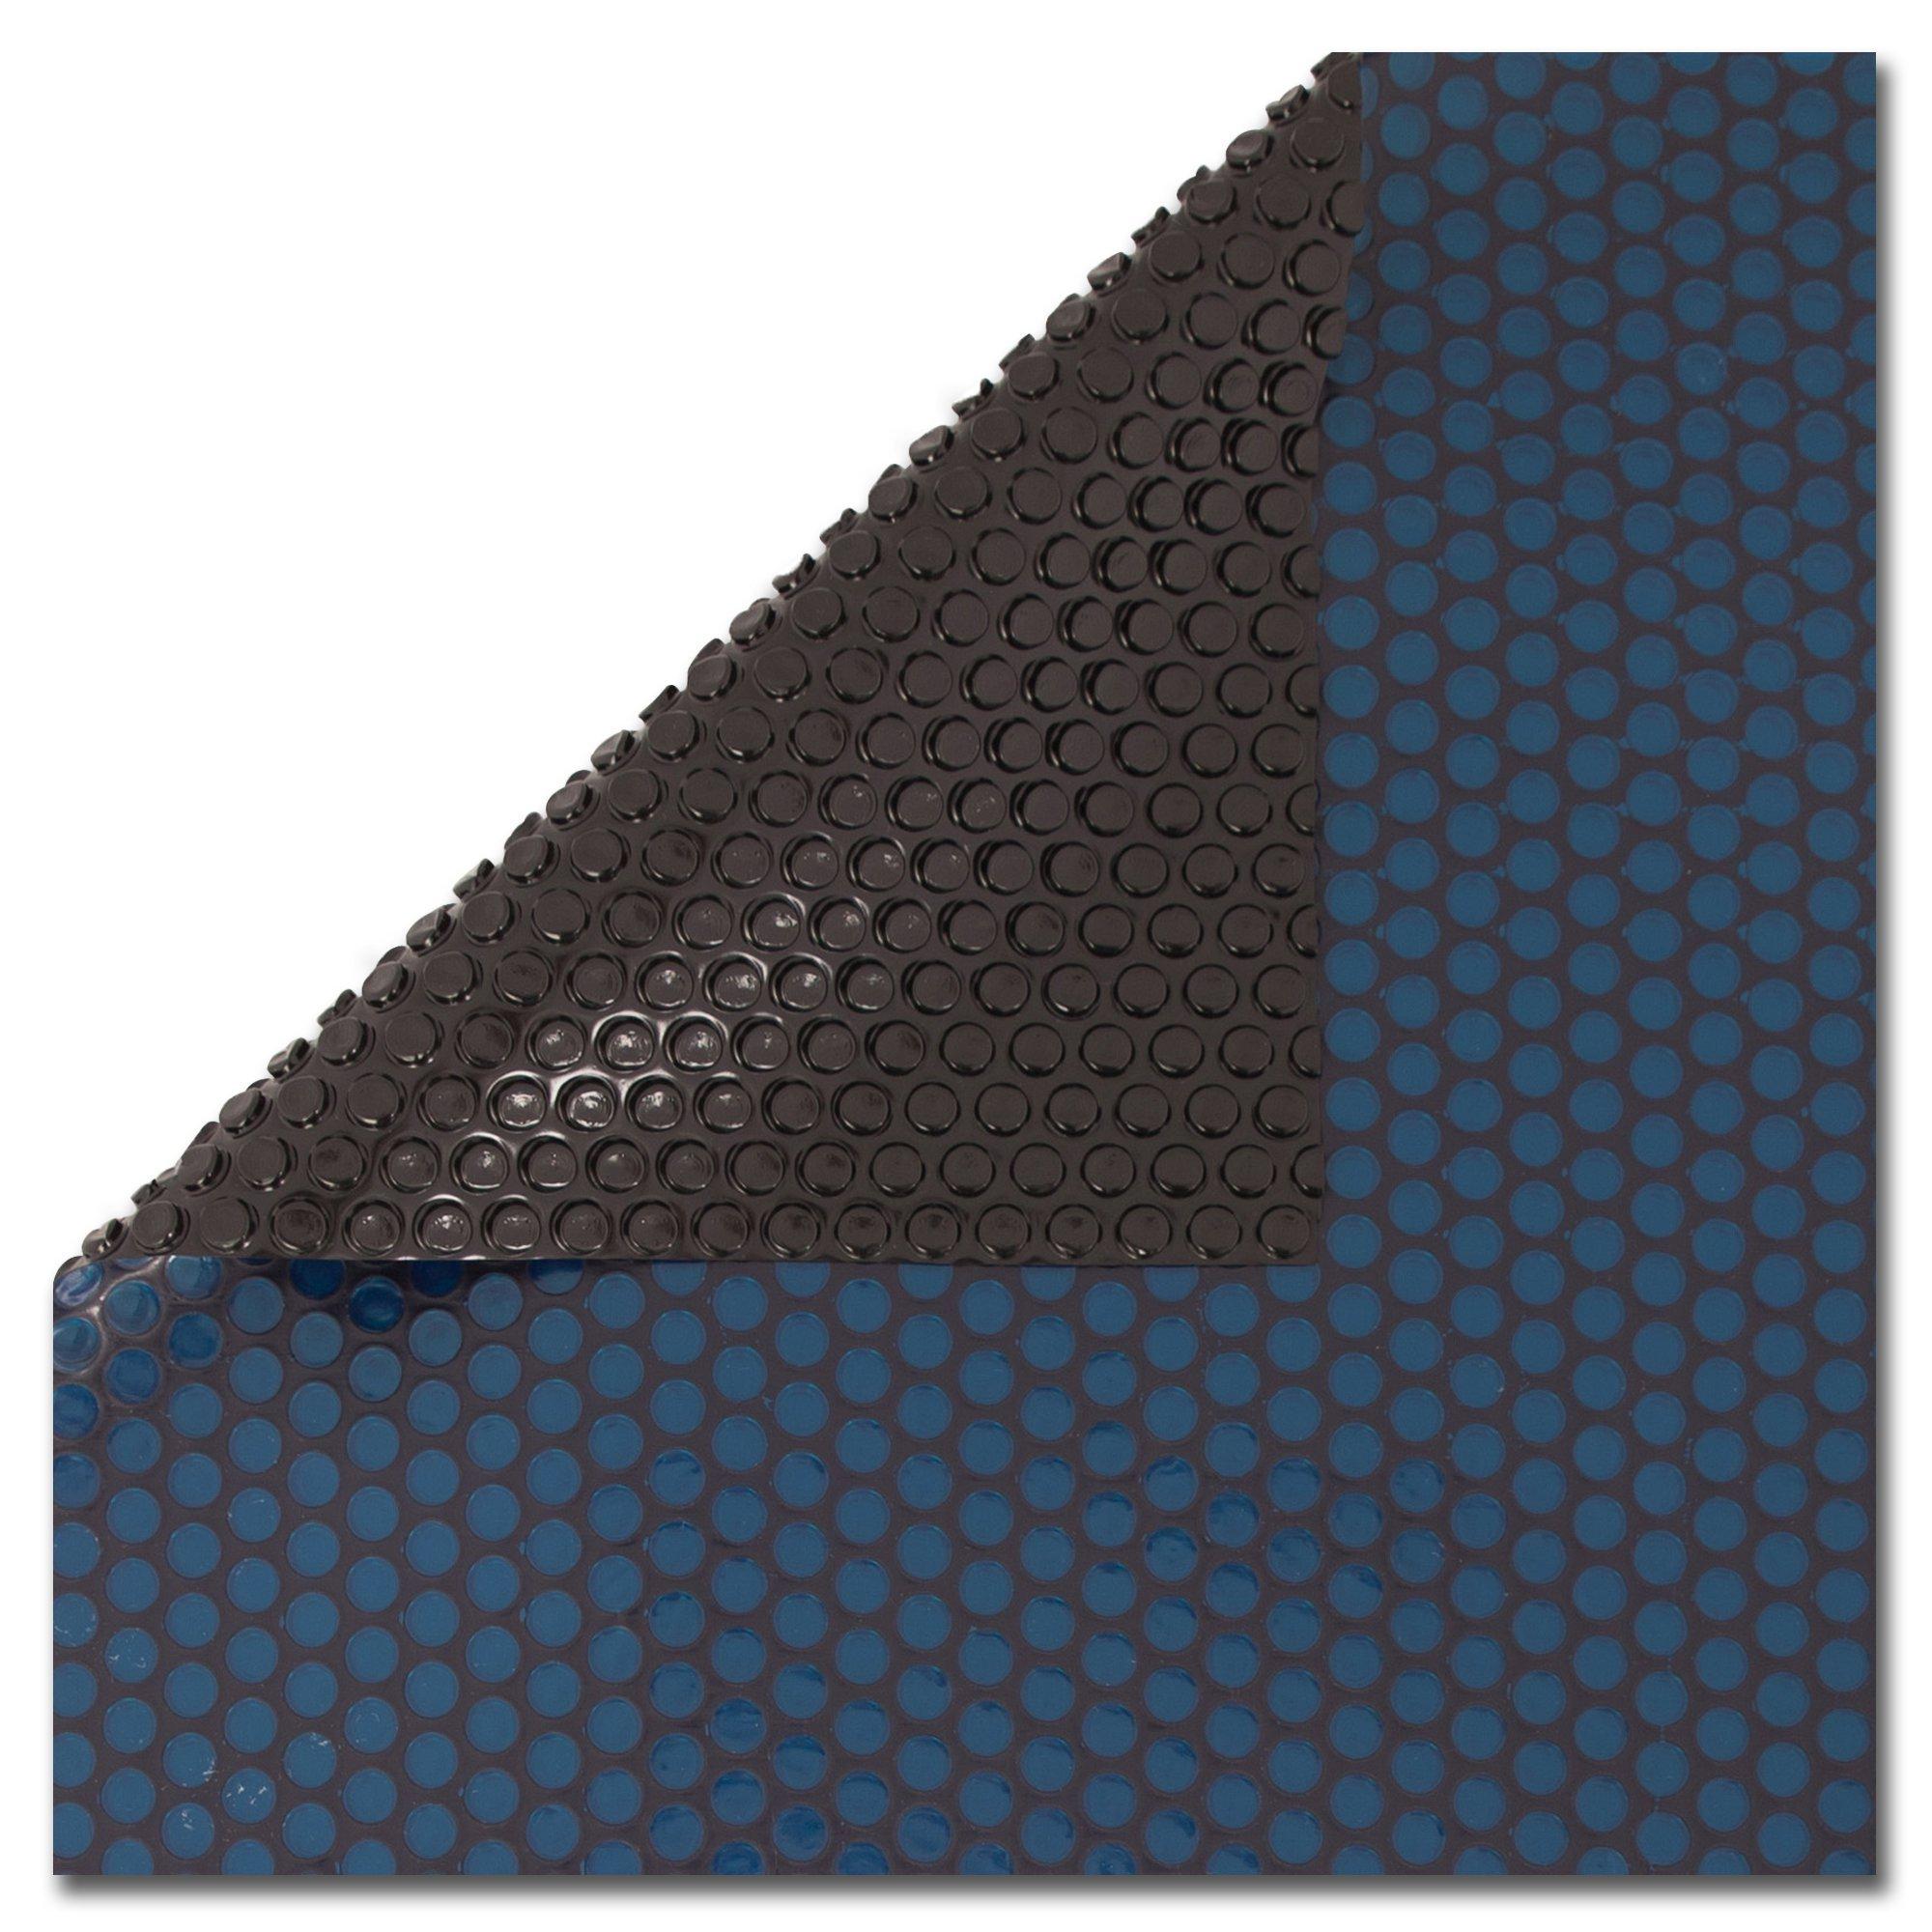 12 Mil Blue/Black 16 x 32 ft Rectangle Swimming Pool Solar Blanket Cover